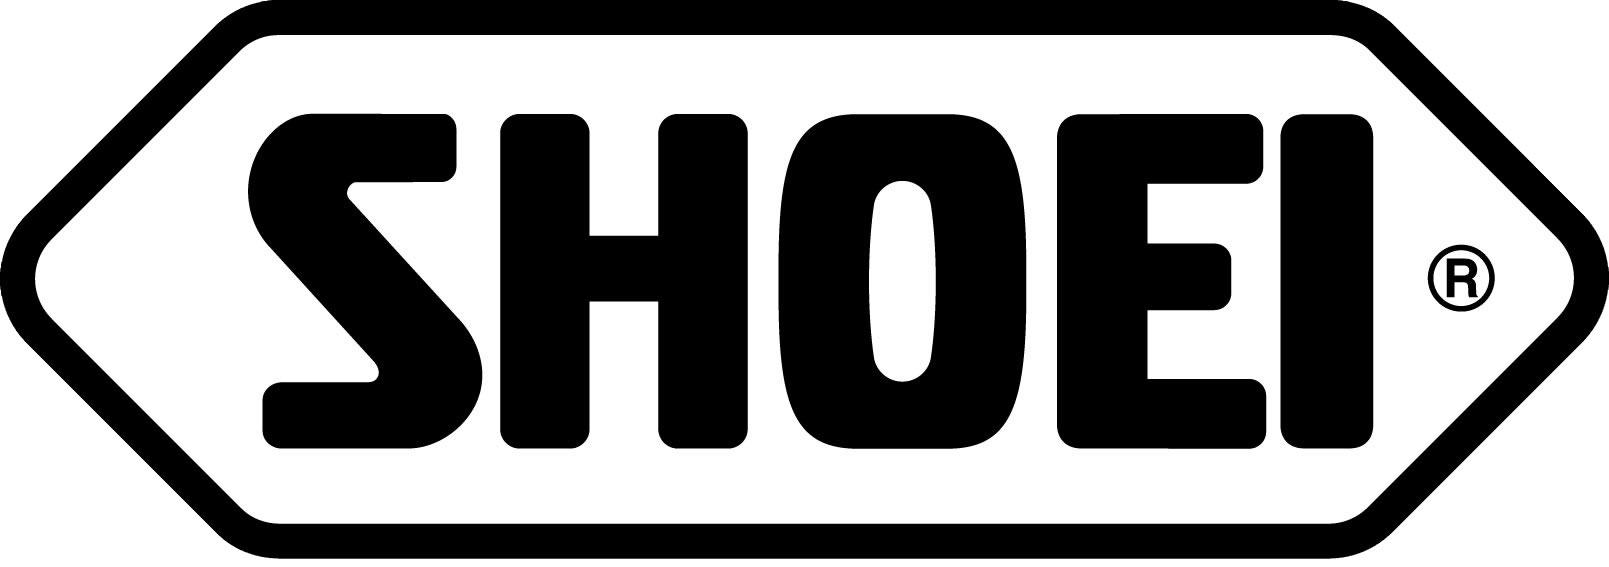 Shoei Helmet Reviews